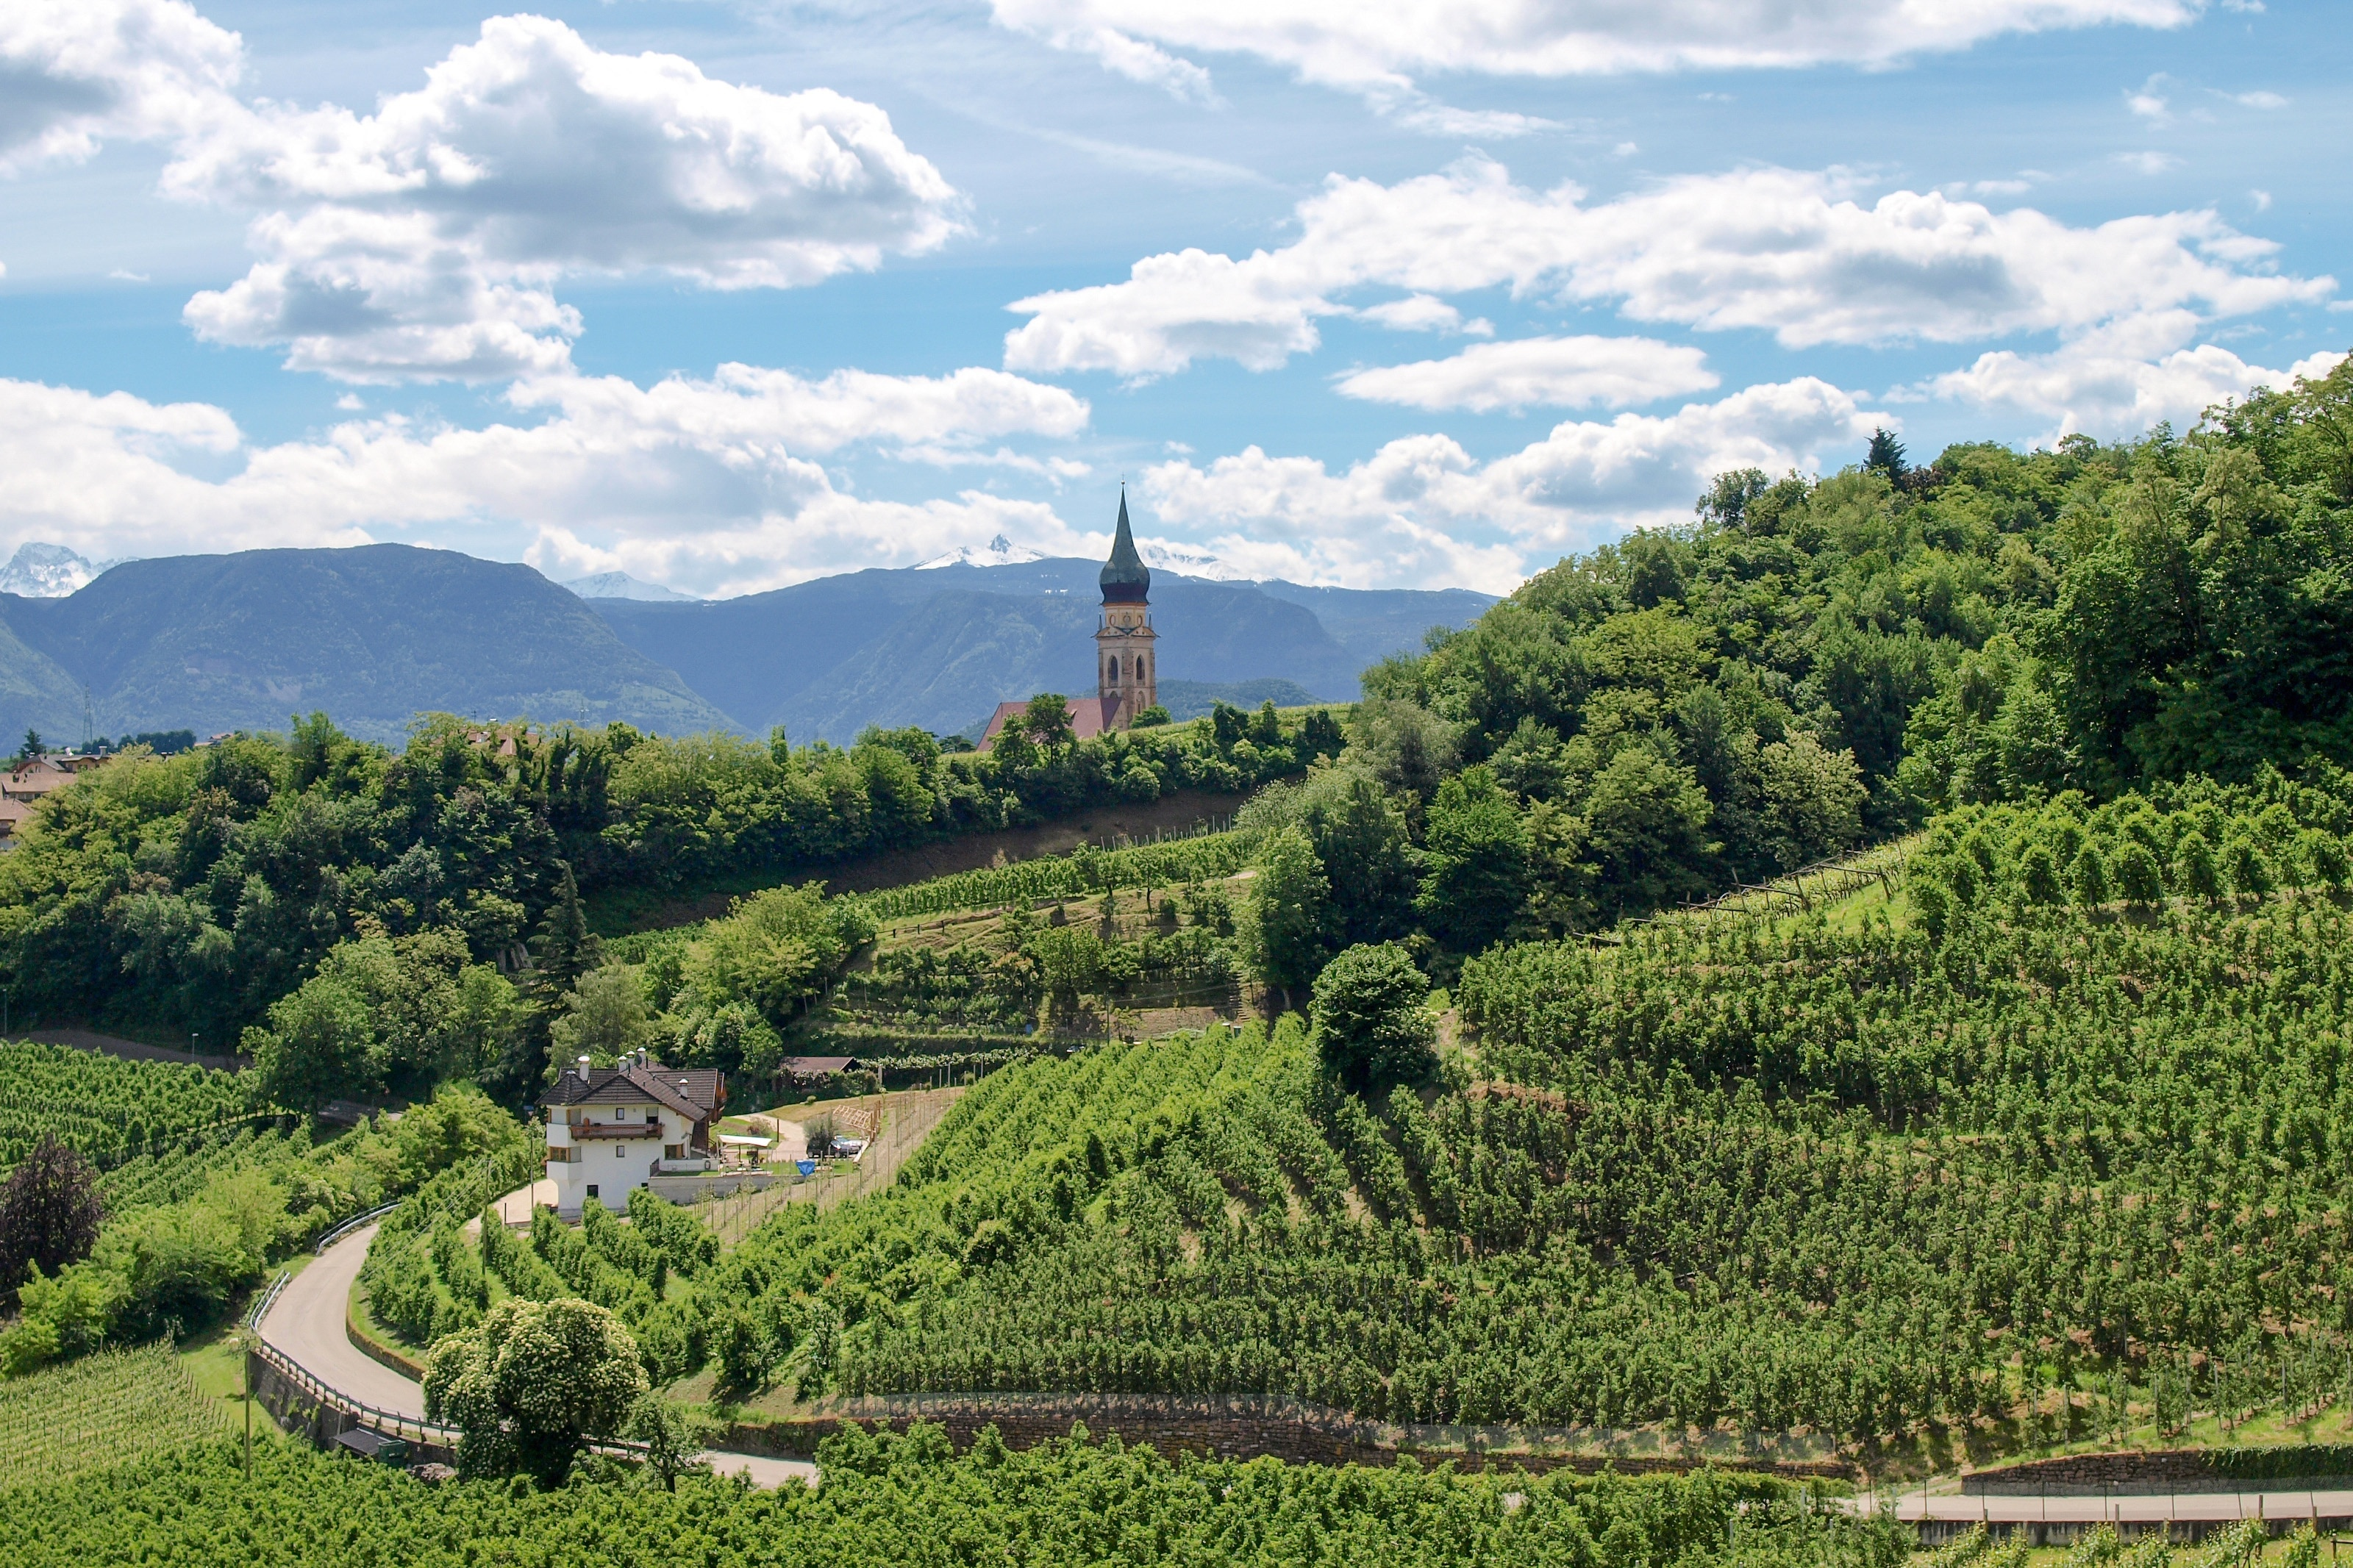 Schenna, Trentino-Alto Adige, Italy